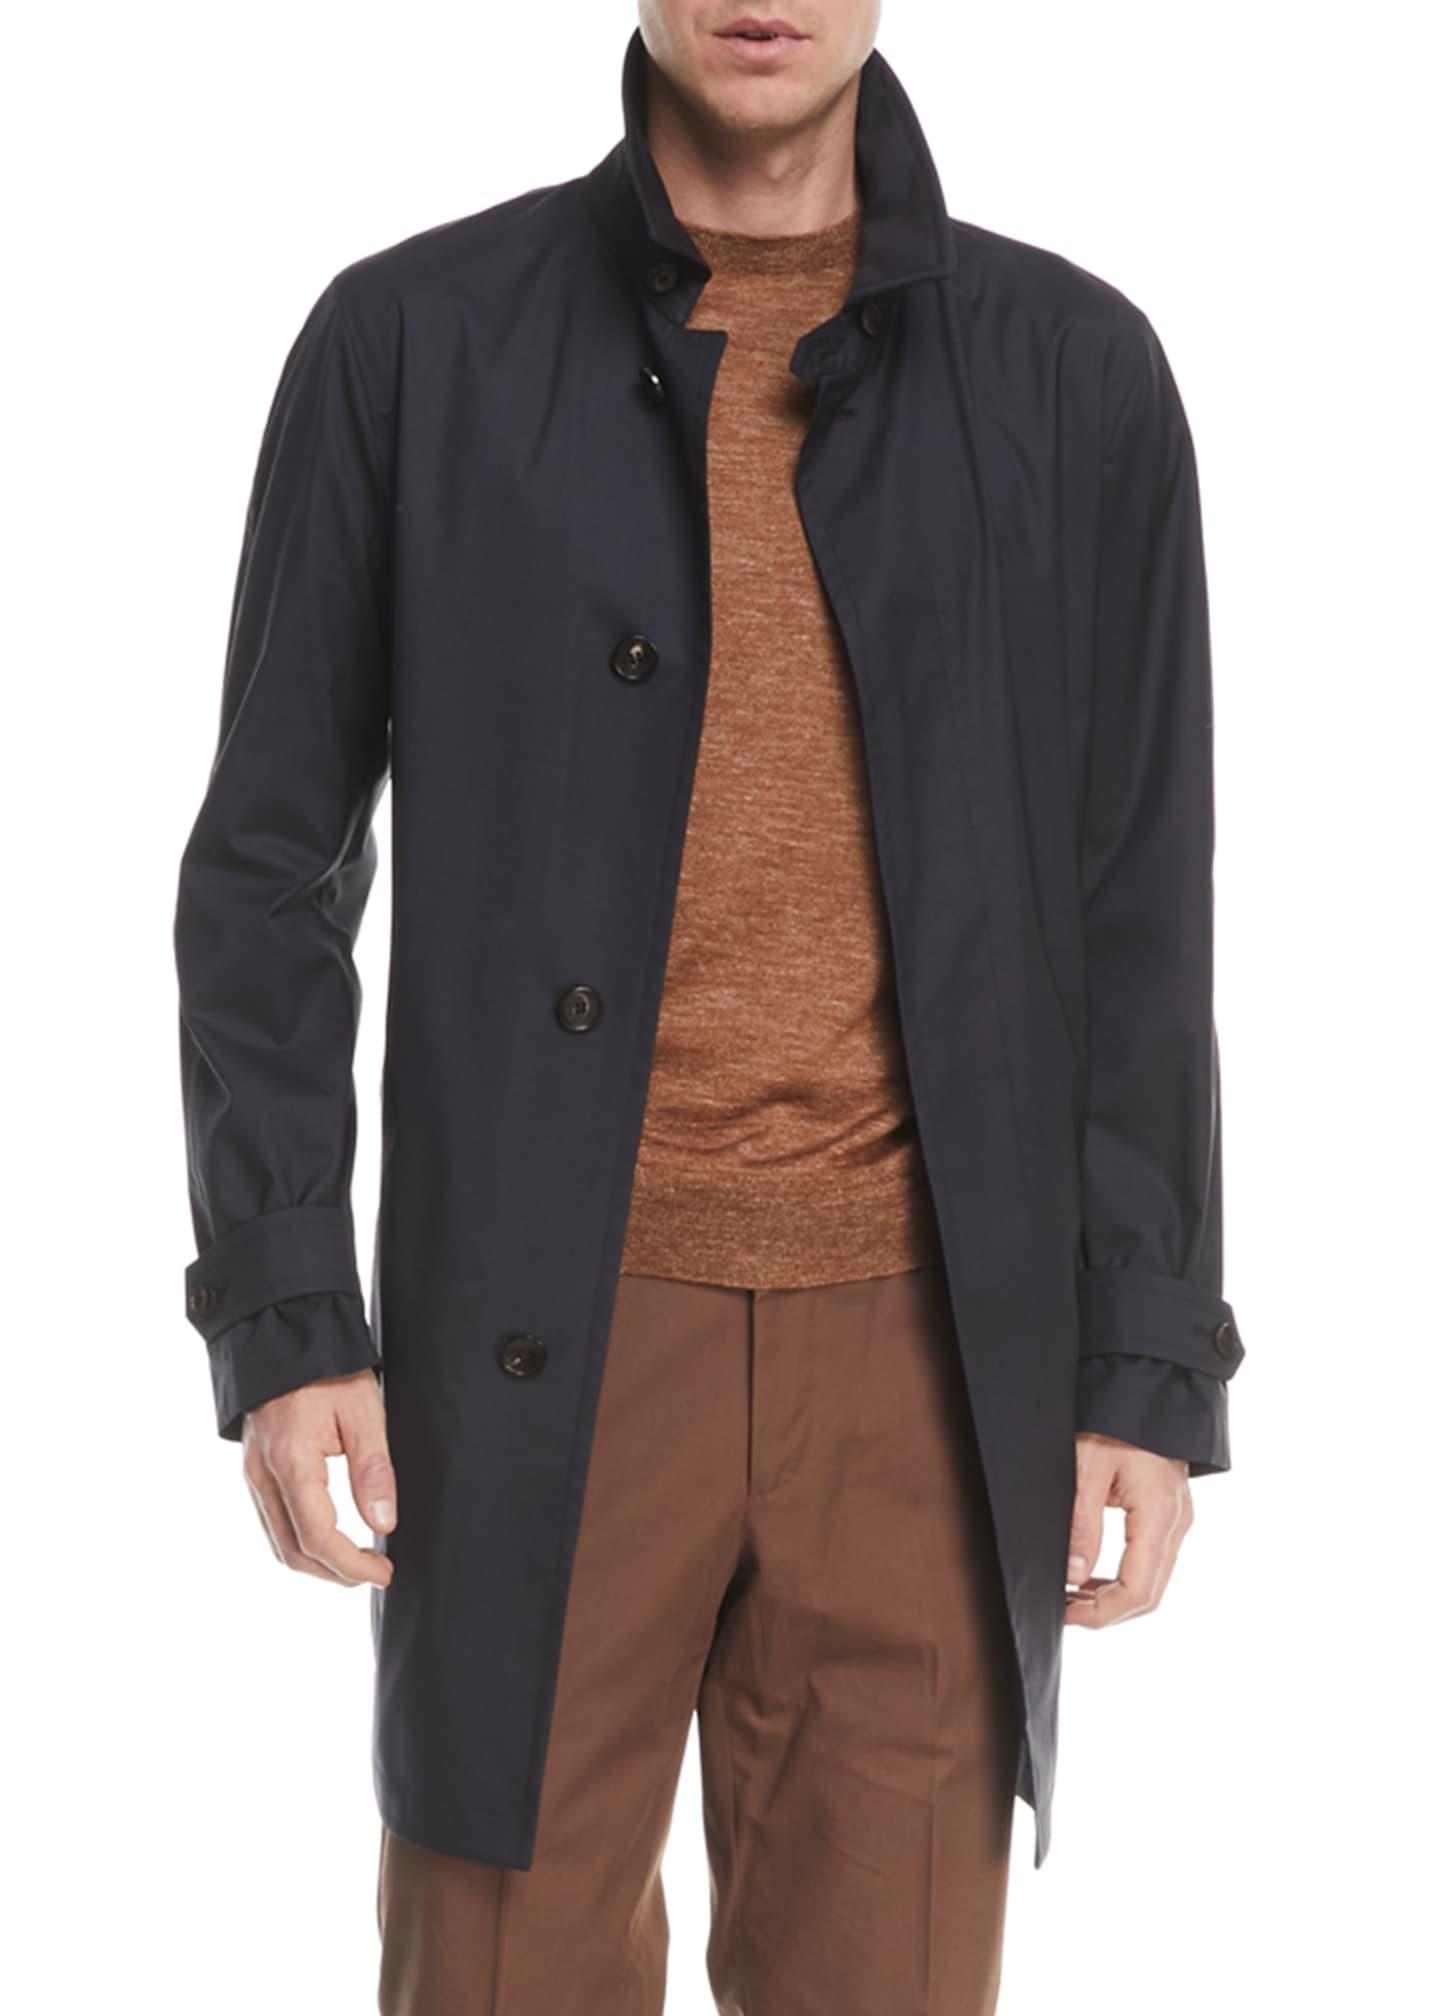 Ermenegildo Zegna Lightweight Traveler Jacket